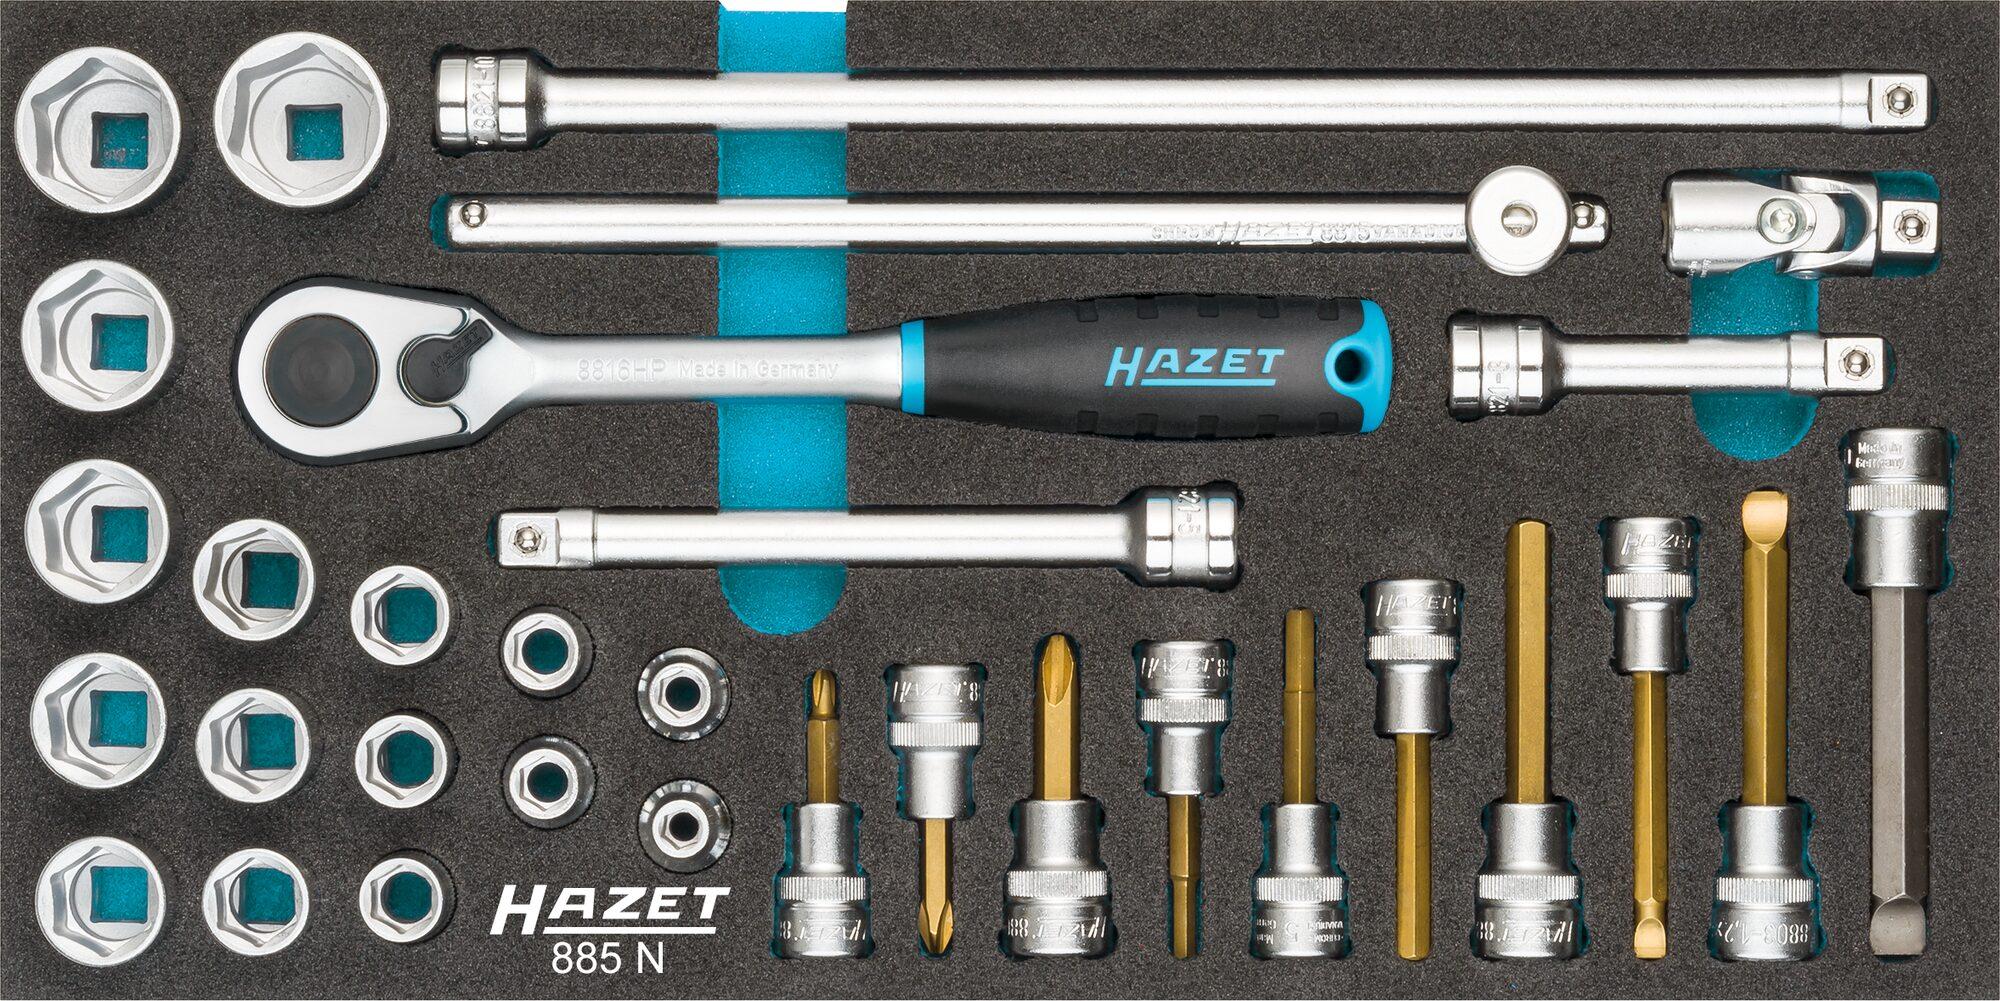 HAZET Steckschlüssel Satz 885N ∙ Vierkant hohl 10 mm (3/8 Zoll) ∙ Anzahl Werkzeuge: 32